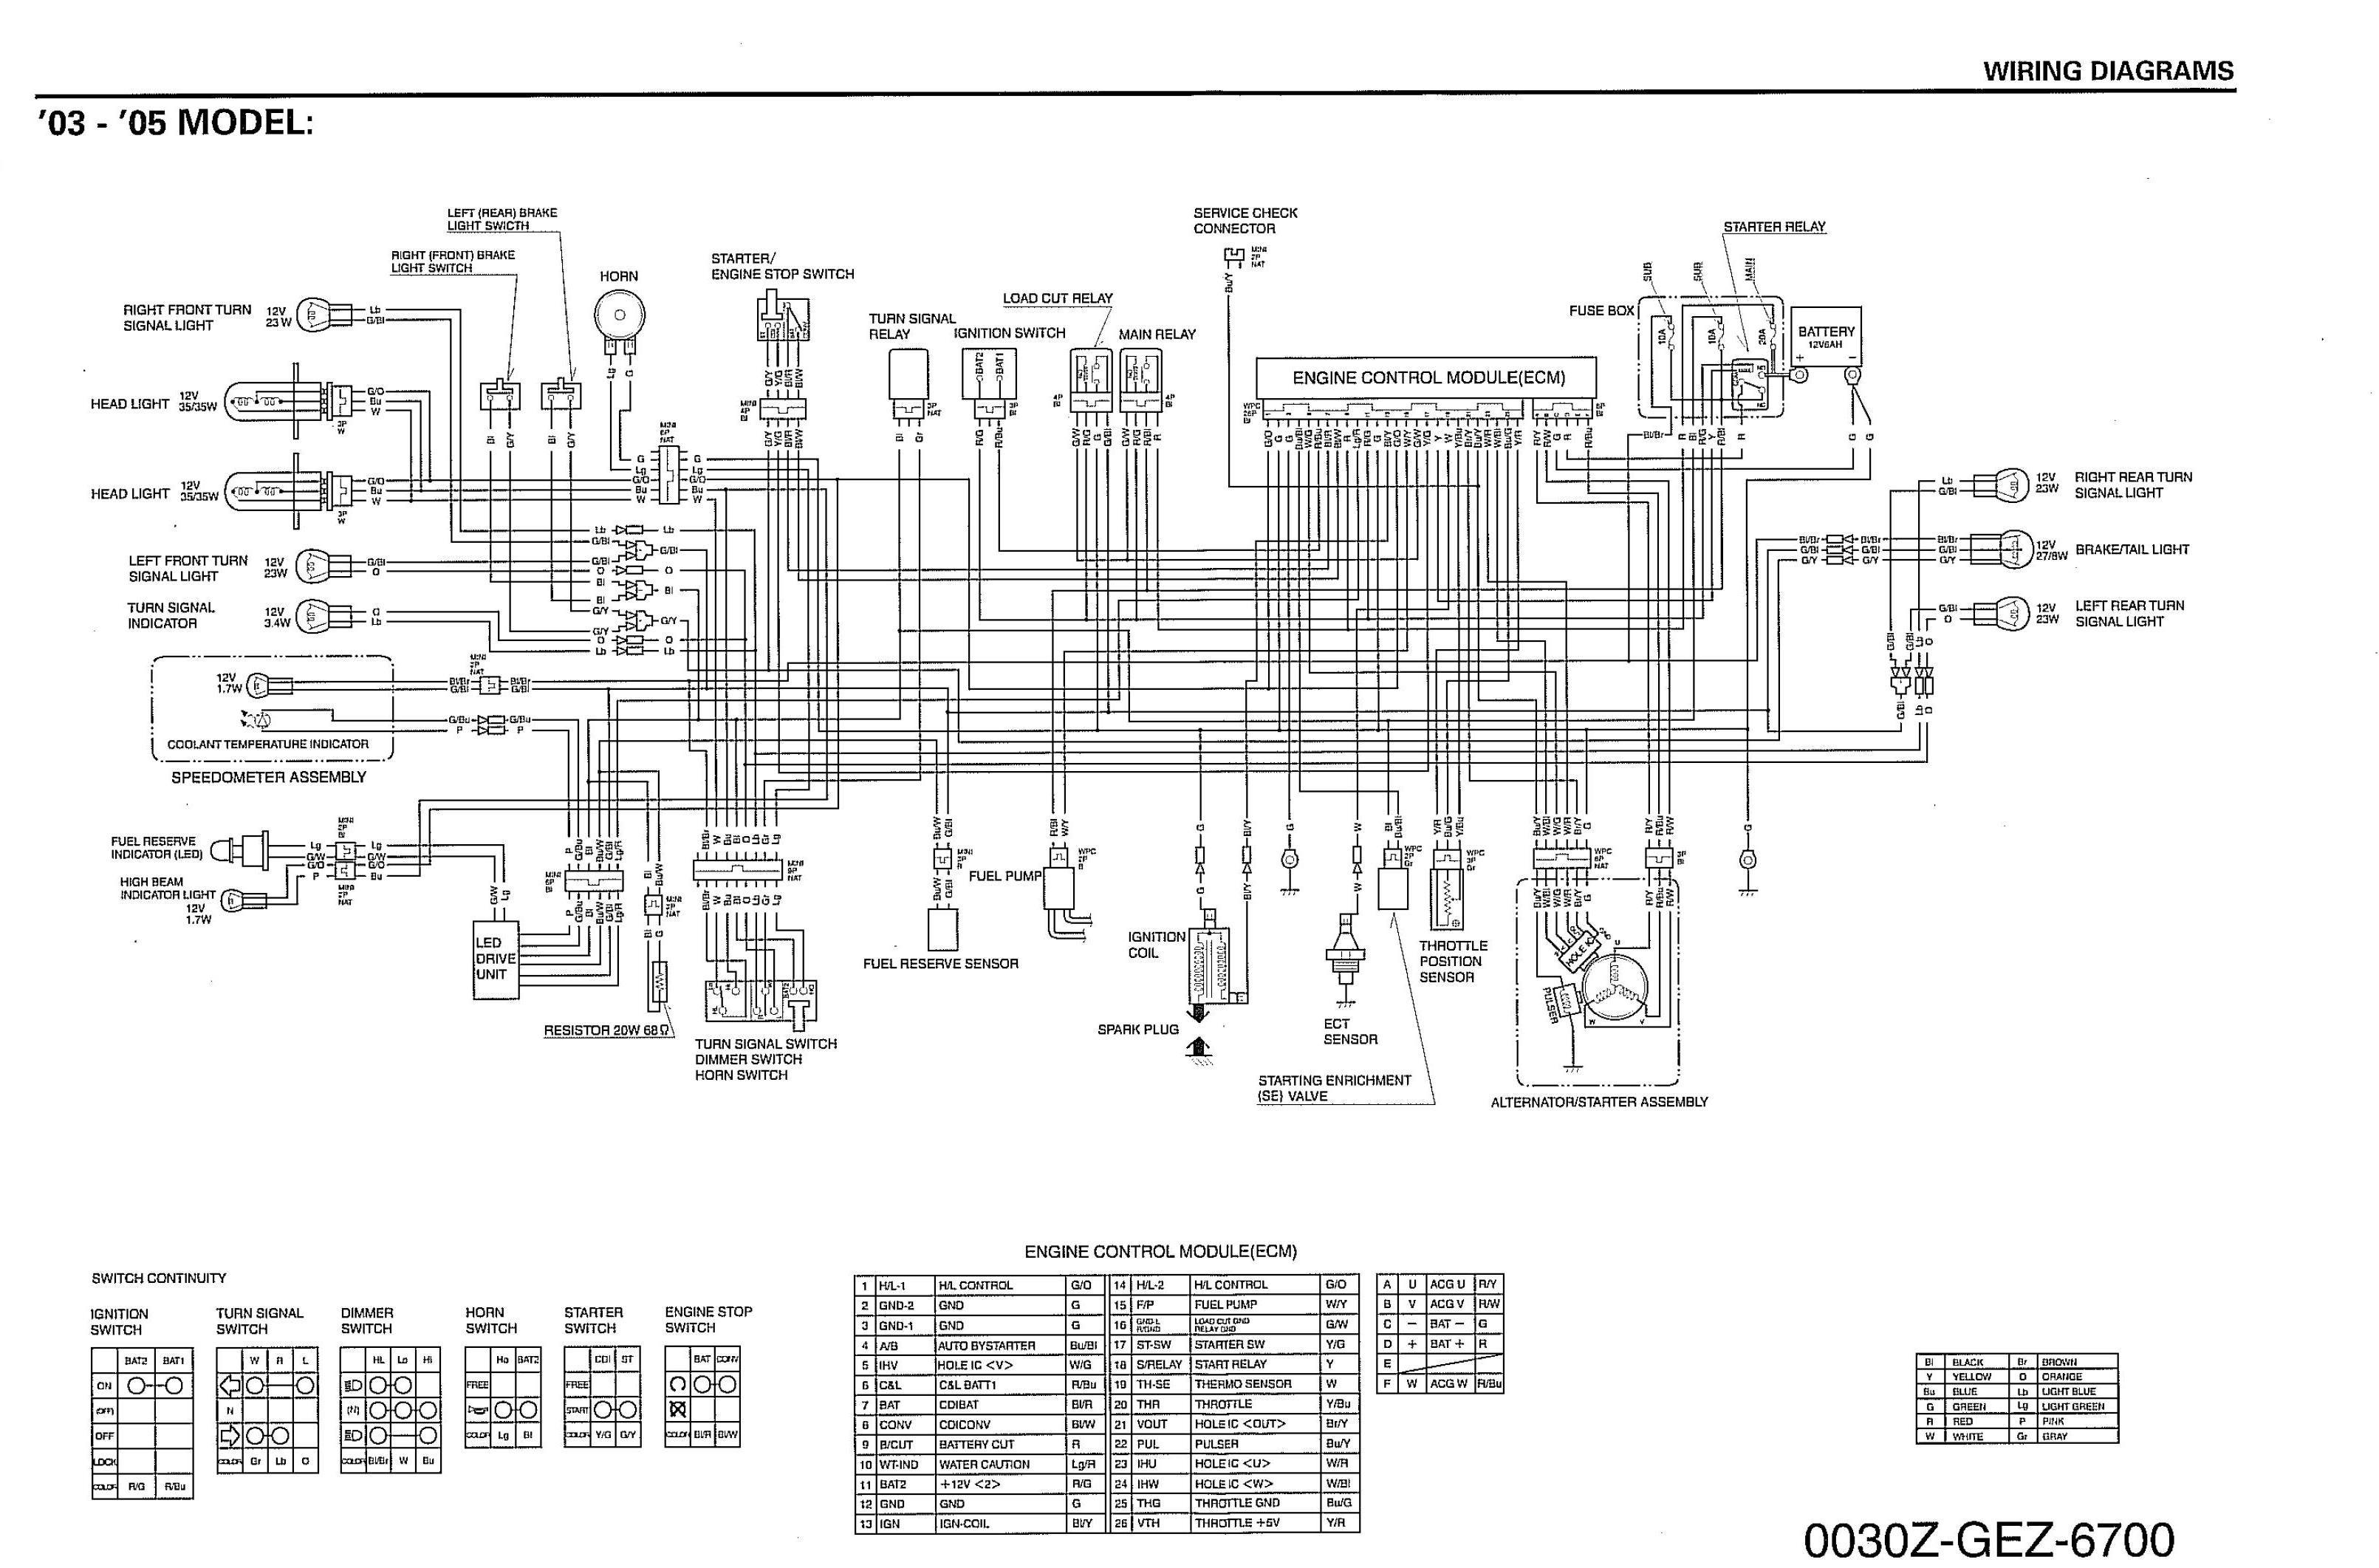 Bmw 545i Engine Wiring Harness Diagram Schematics Diagrams 1995 318i 2004 745li